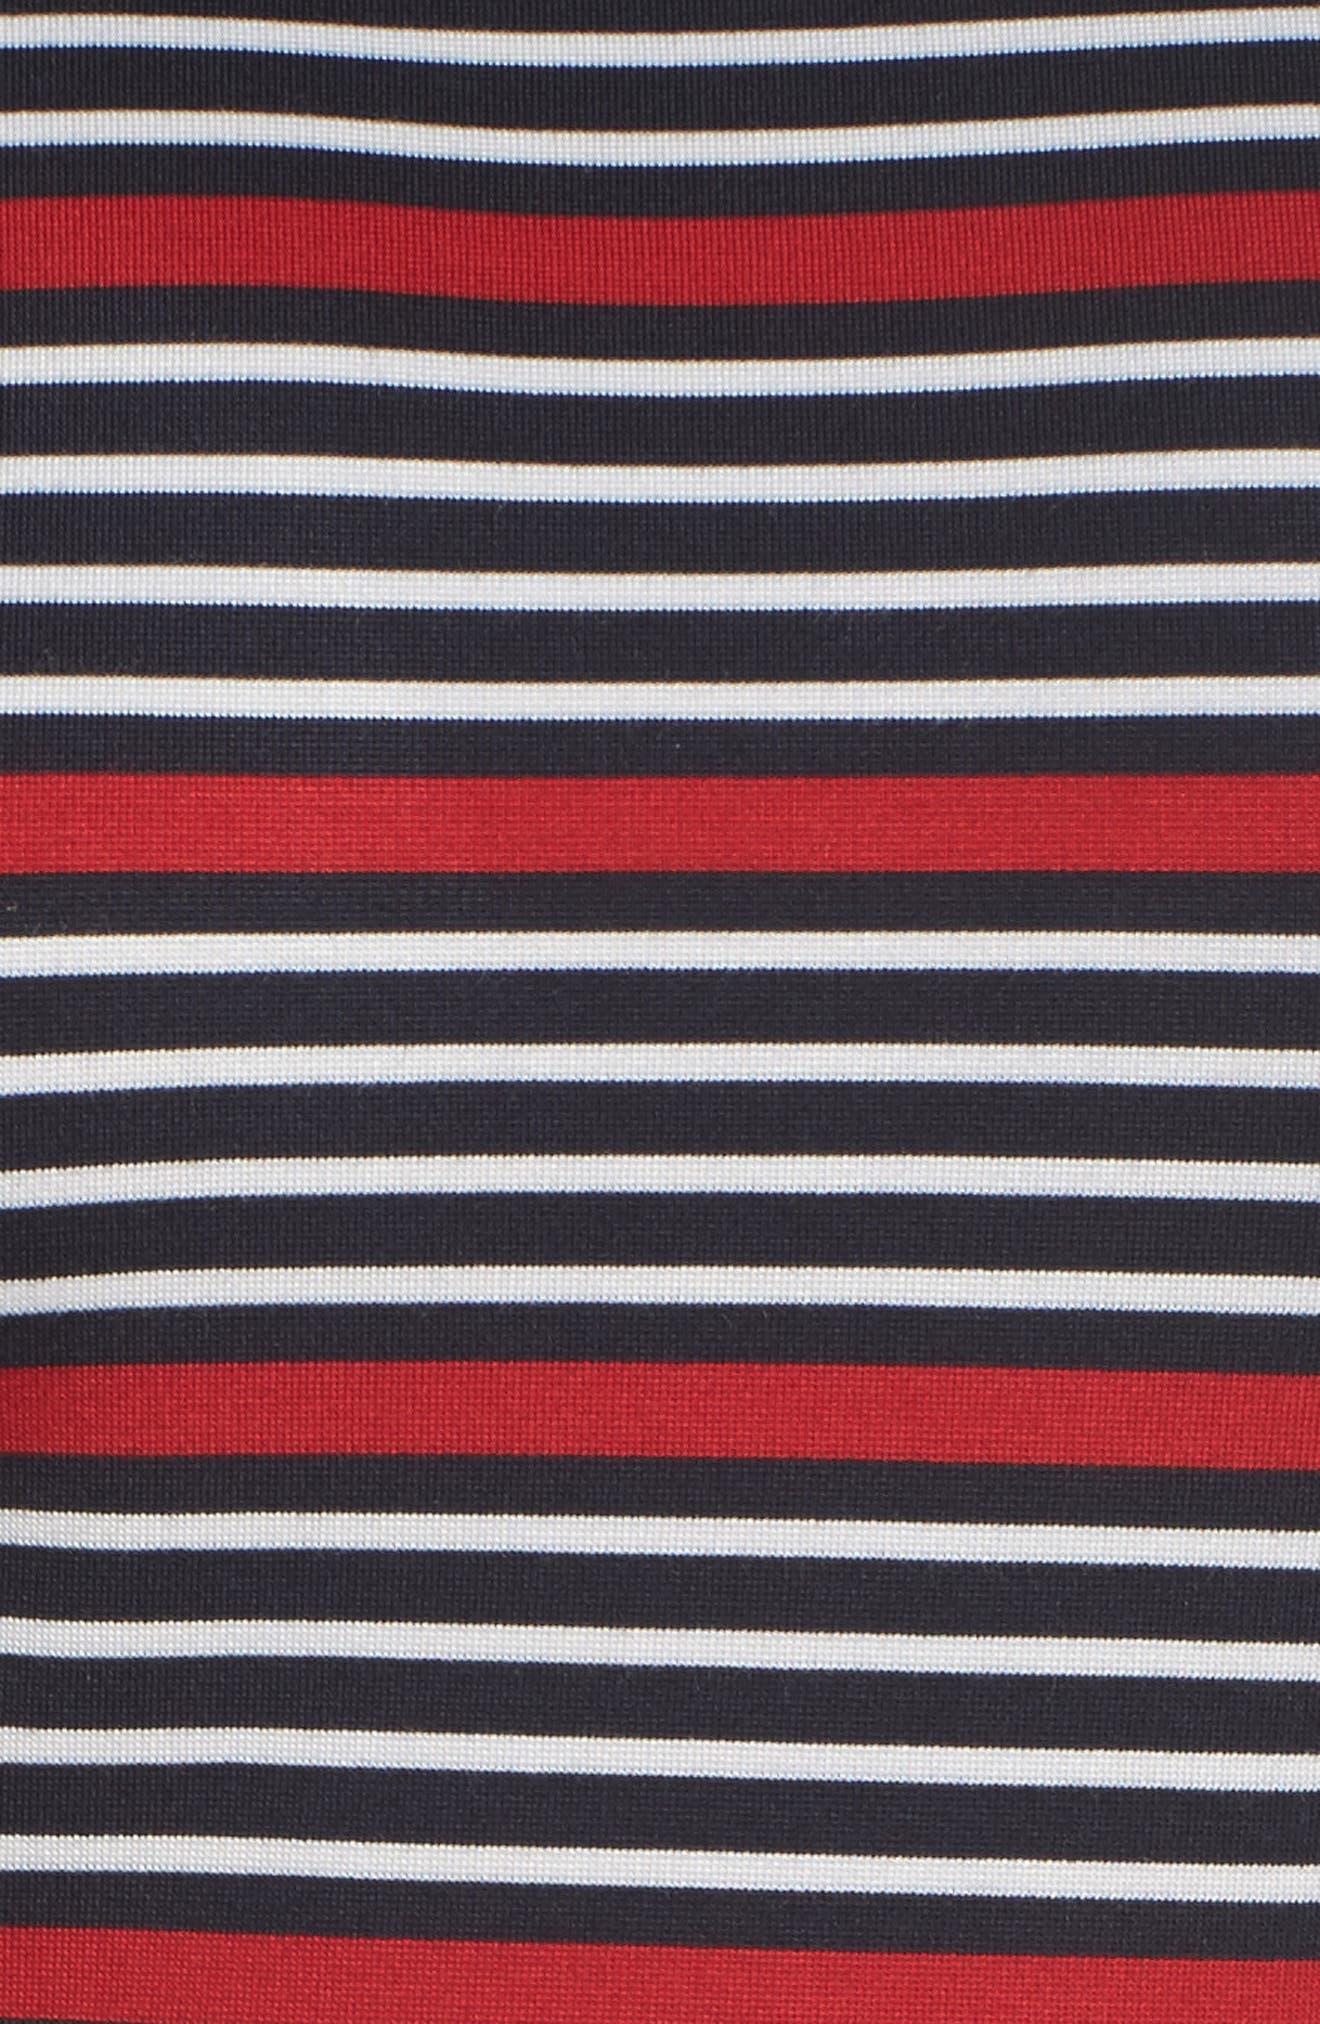 Scarlette Stripe Fit & Flare Dress,                             Alternate thumbnail 5, color,                             Navy/ Red/ White Stripe